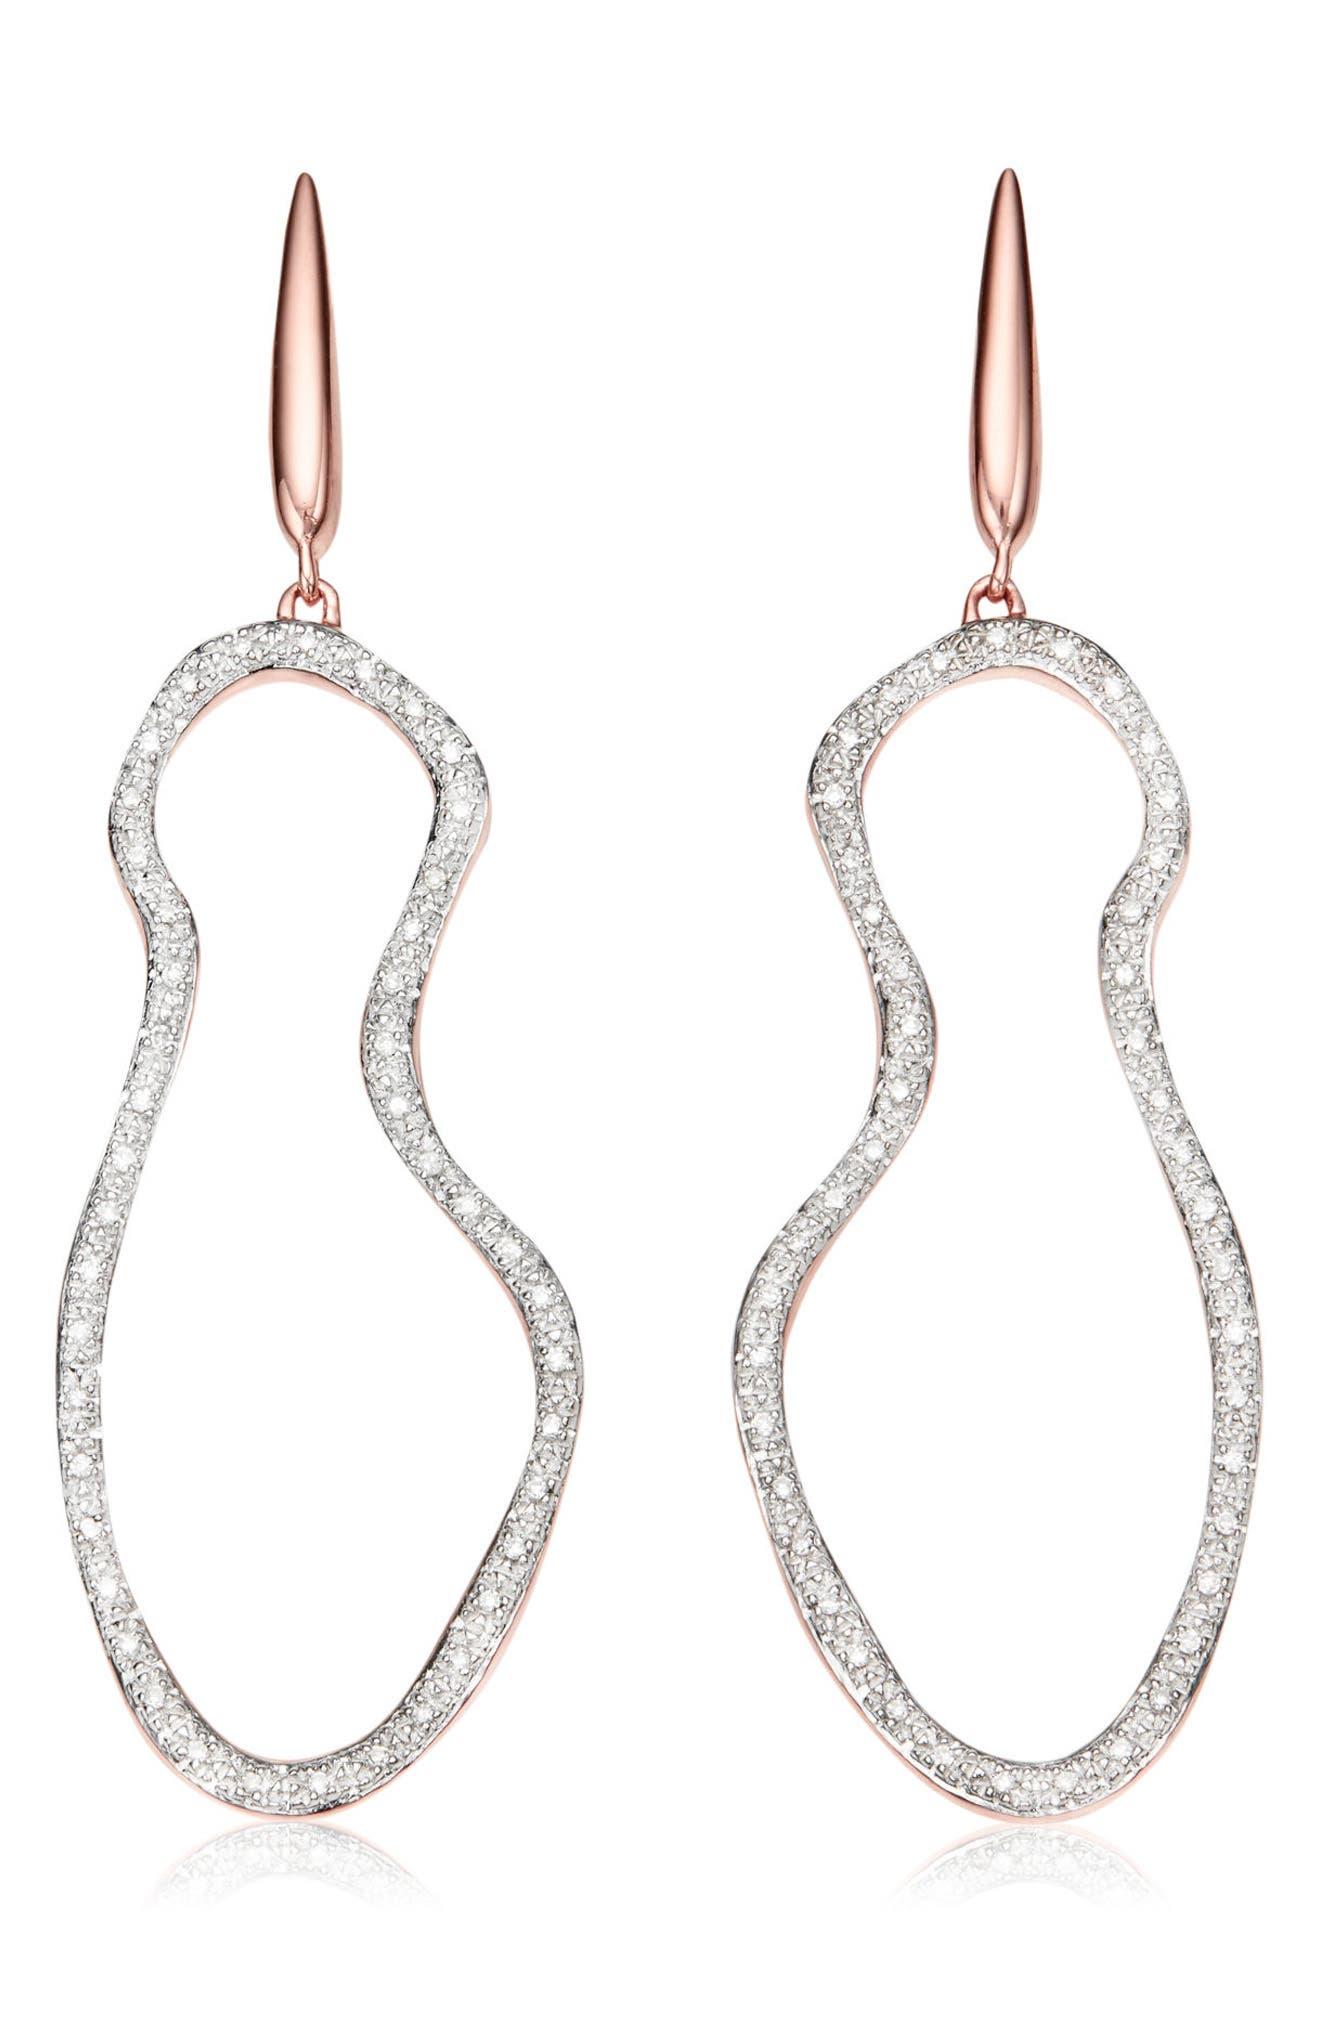 Riva Diamond Drop Earrings,                             Main thumbnail 1, color,